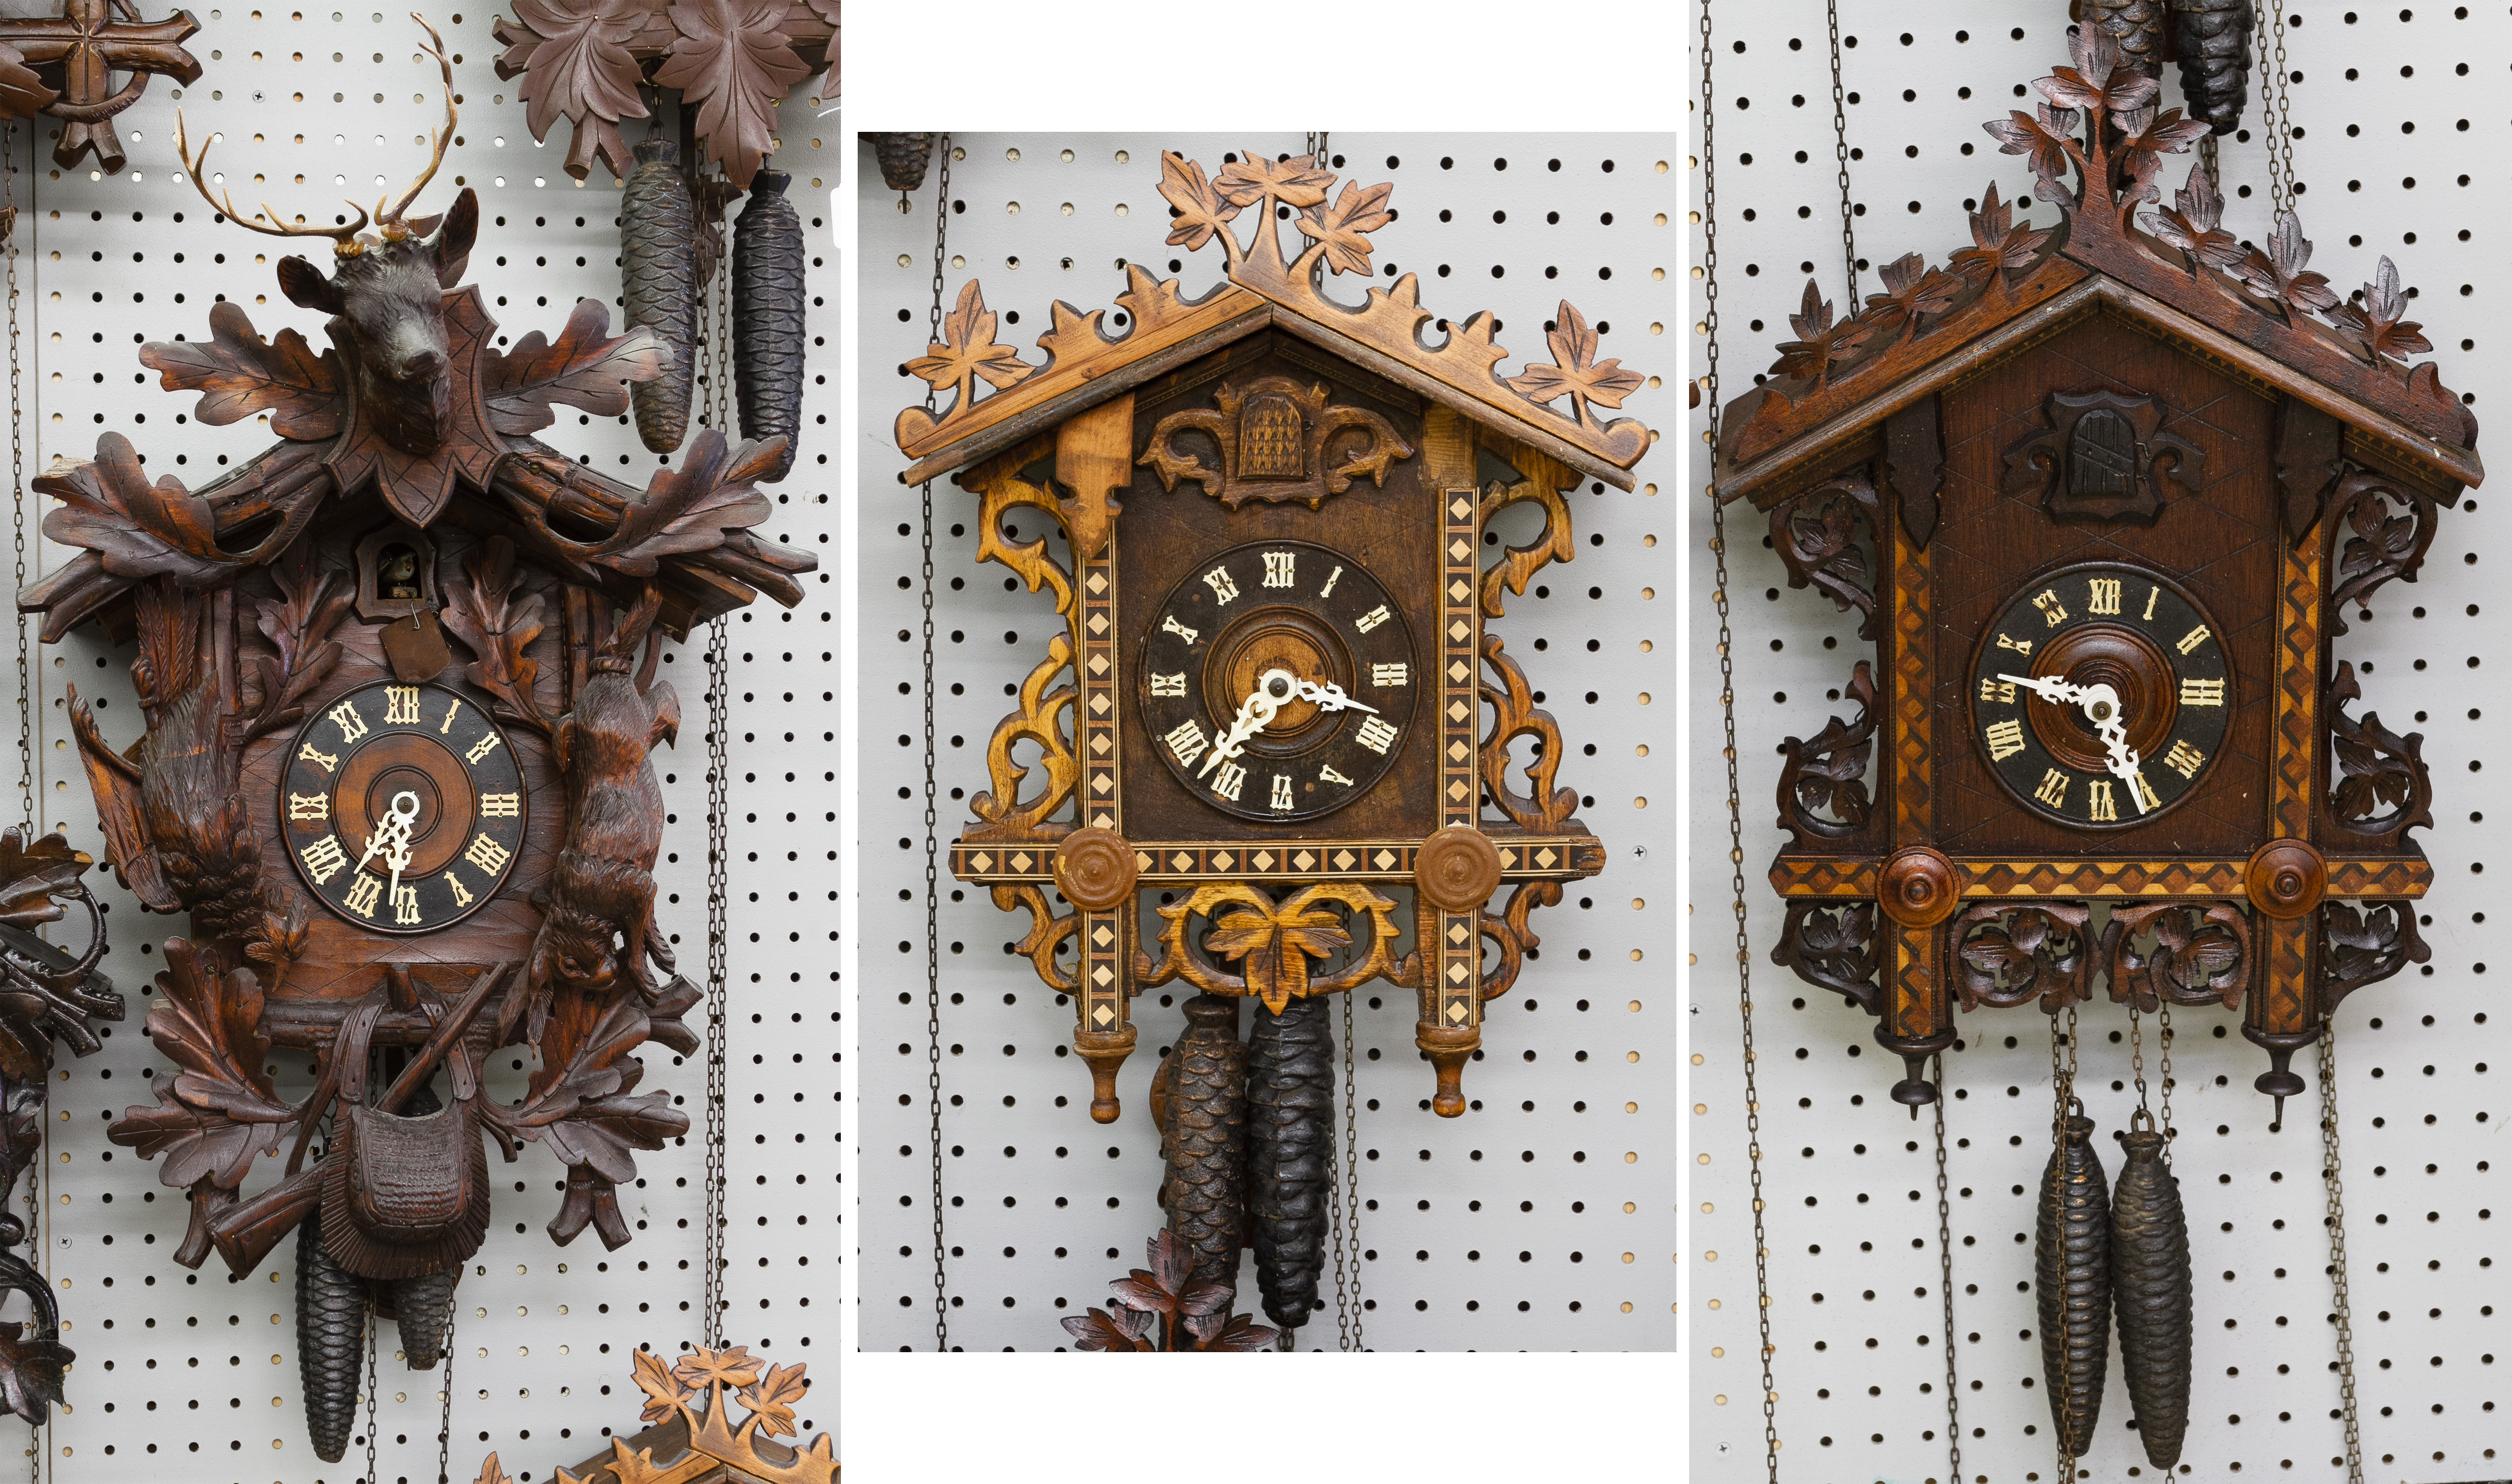 Black forest style wooden cuckoo clocks - Wooden cuckoo clocks ...